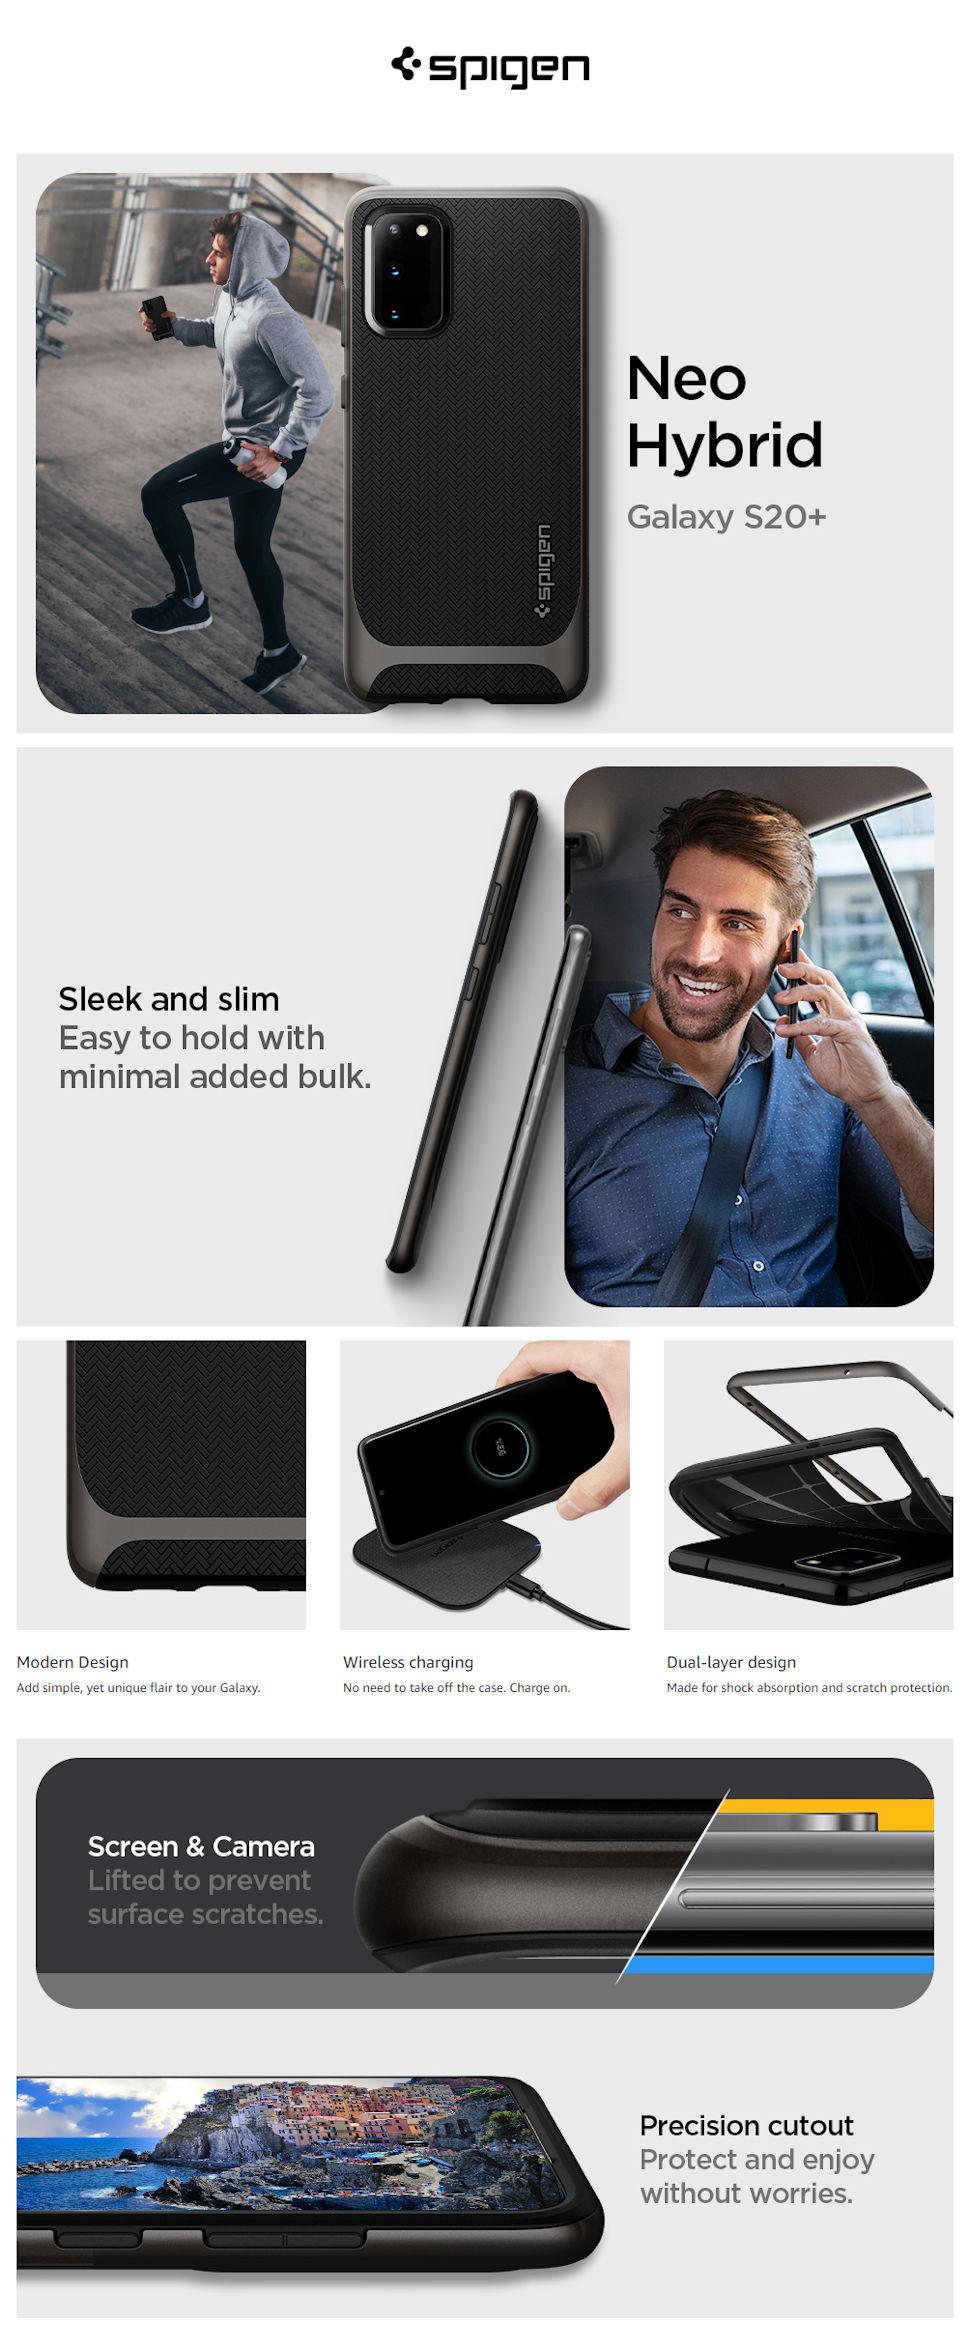 Gohub-Shop-Spigen Neo Hybrid, gunmetal - Galaxy S20+